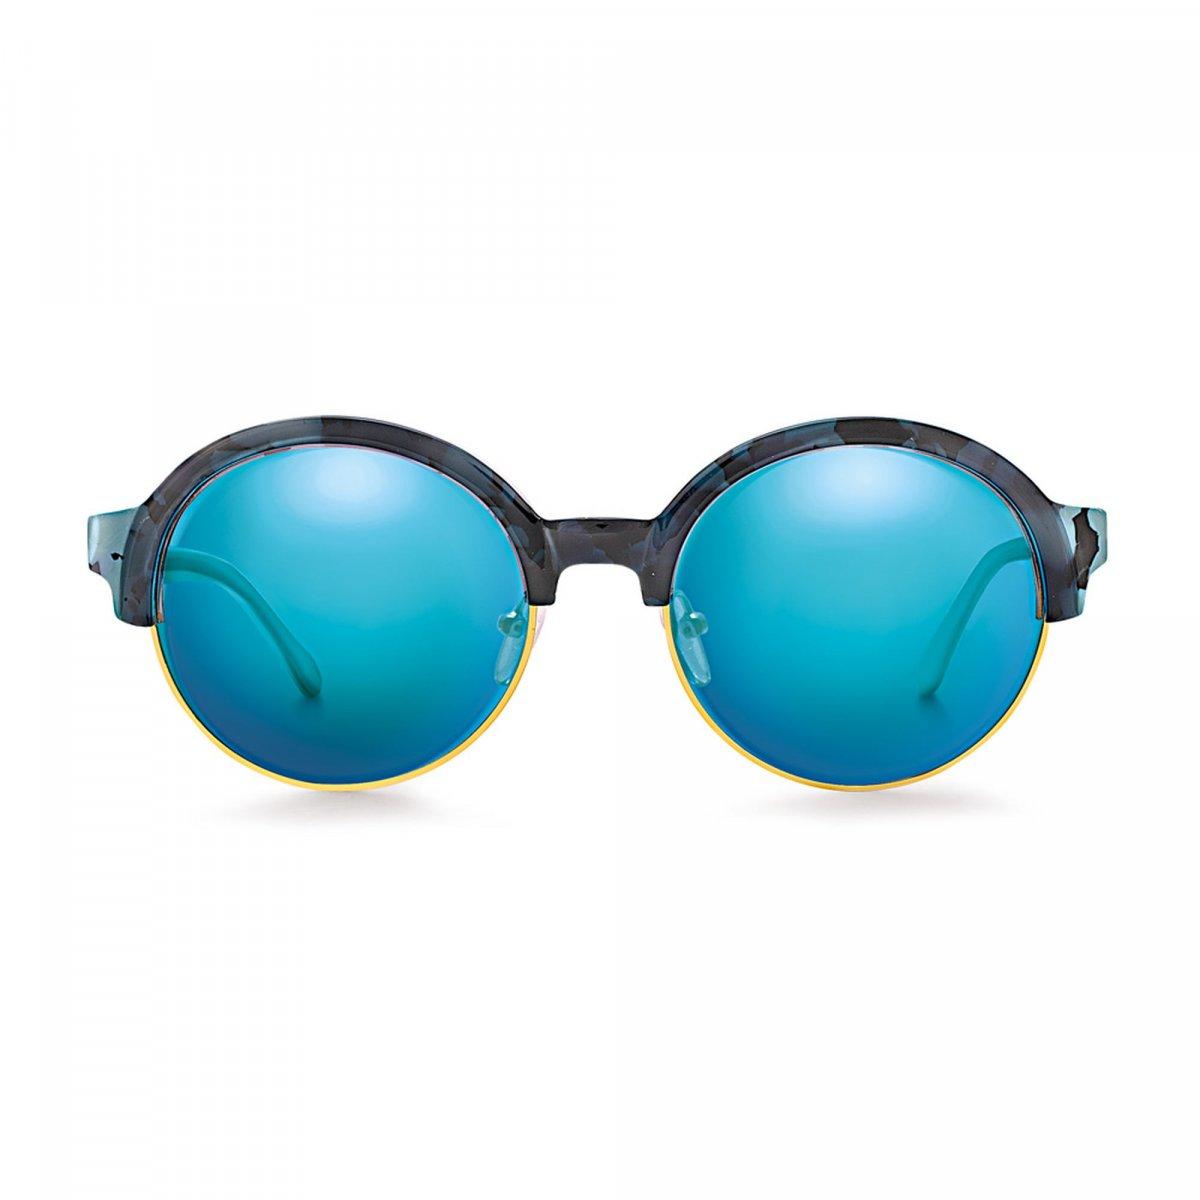 Okuliare FOLLI FOLLIE s modrým rámom